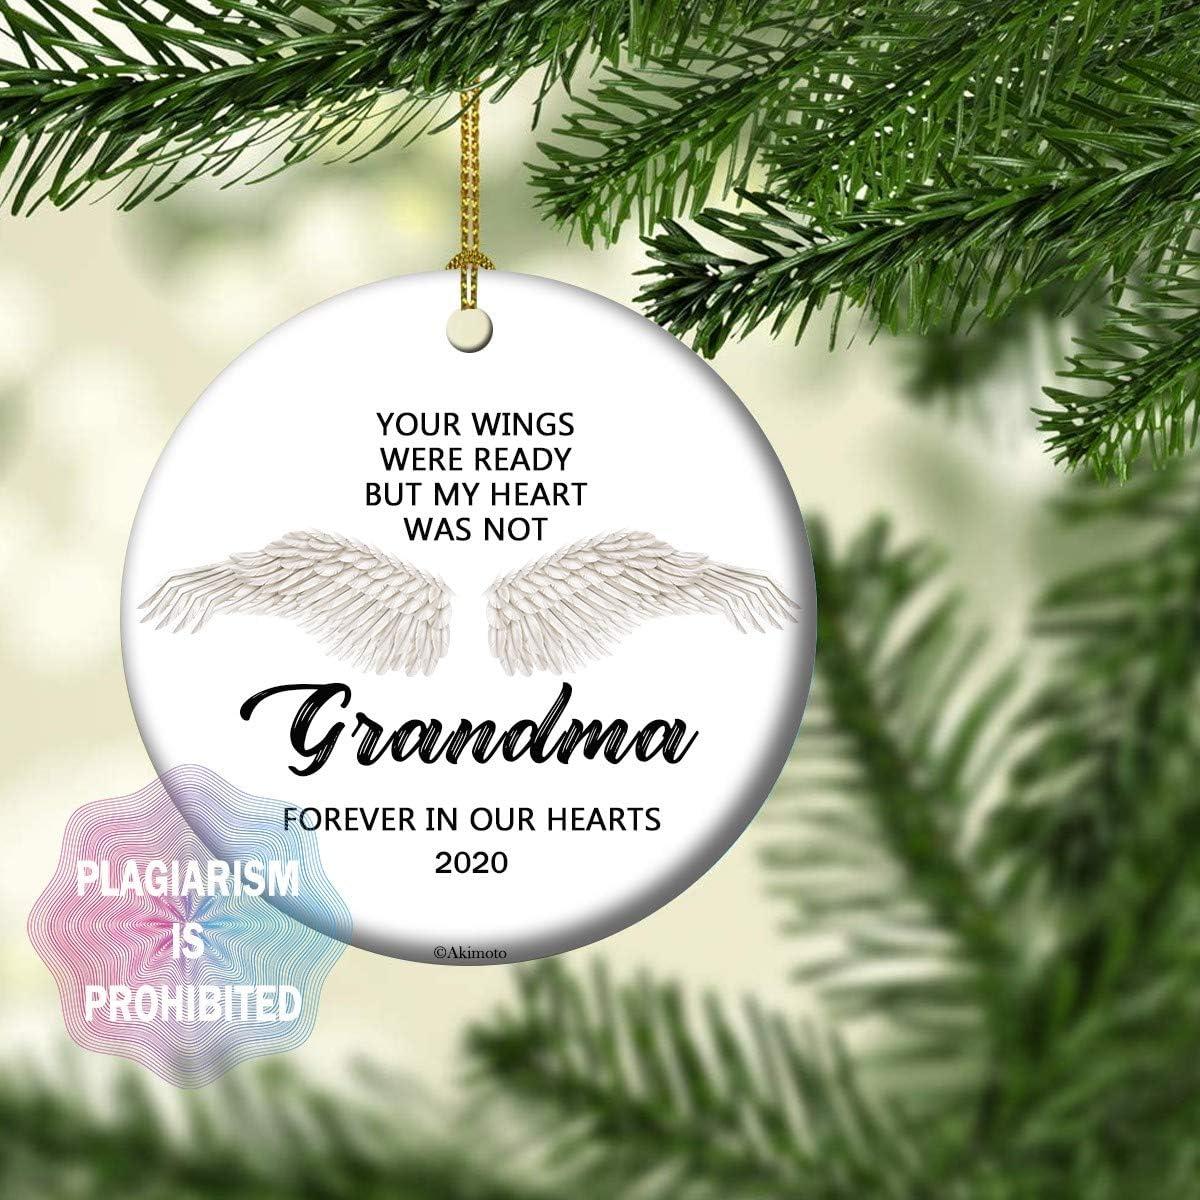 "Akimoto Loss of Grandma Remembrance Ornament Christmas 2020 Sympathy Condolence Gift, White Angel Wings 2020 Christmas Decoration, 3"" Flat Circle Ceramic Keepsake Box(Grandma)"